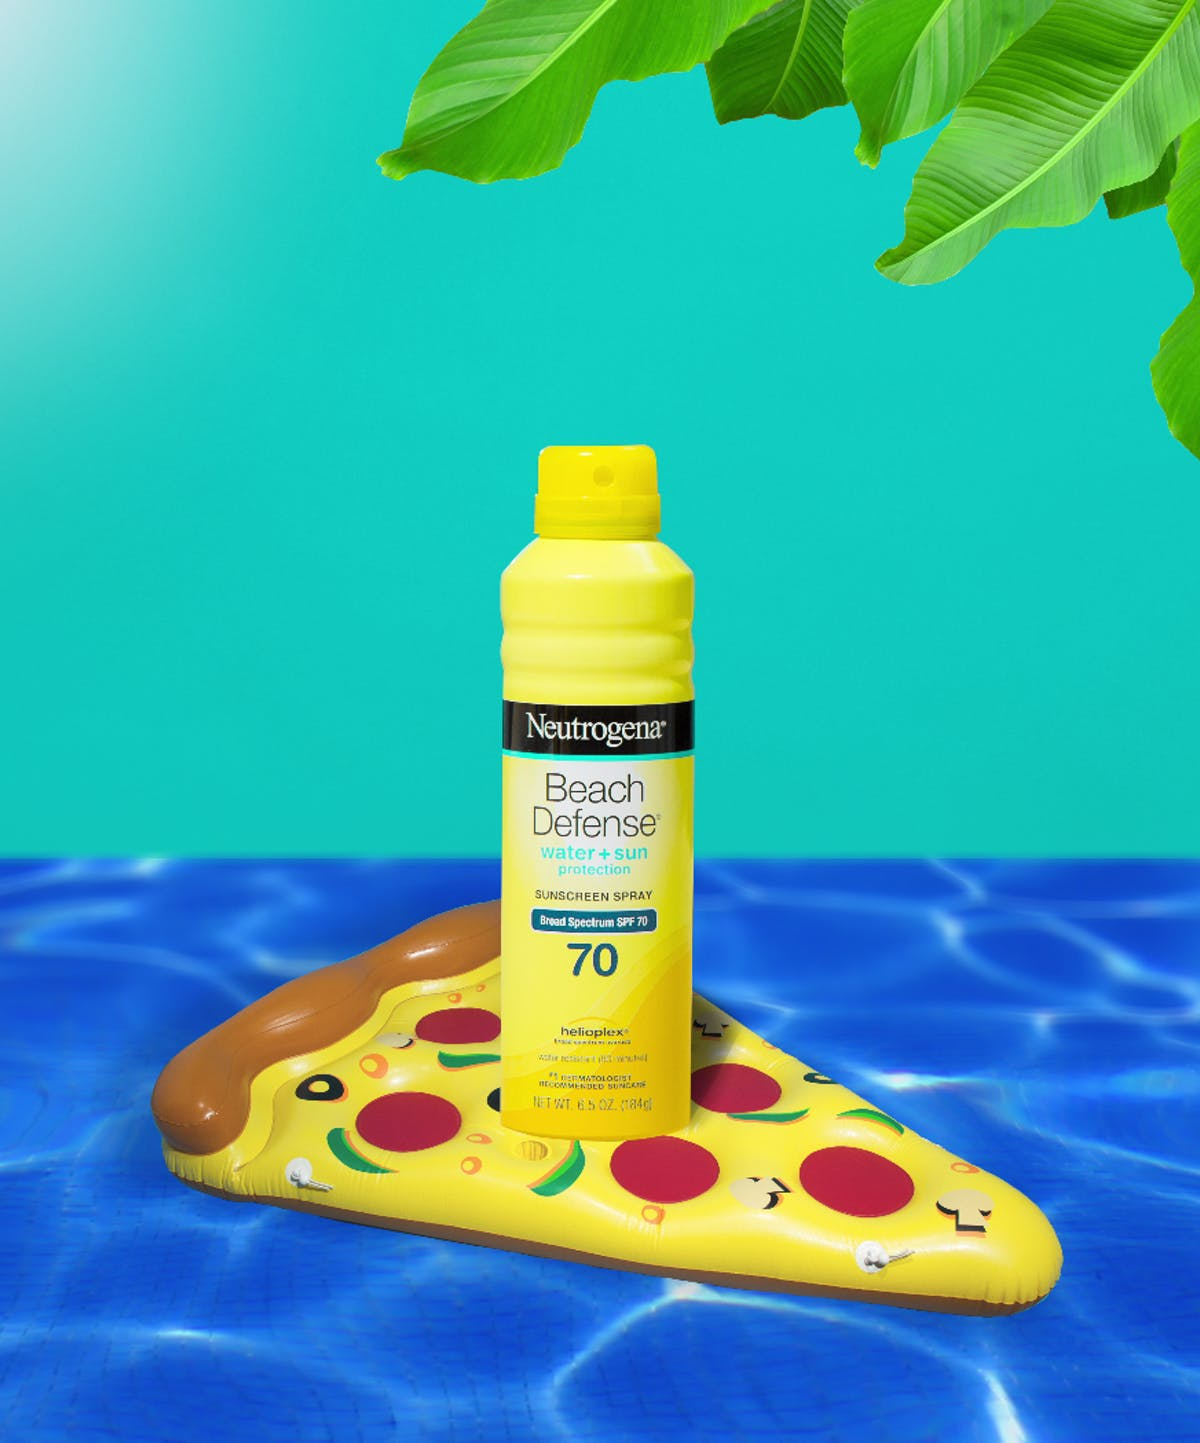 Beach Defense Sunscreen Lotion Spf 70 Neutrogena Nivea Moisture Sun 50 100 M Defensereg Water Protection Broad Spectrum